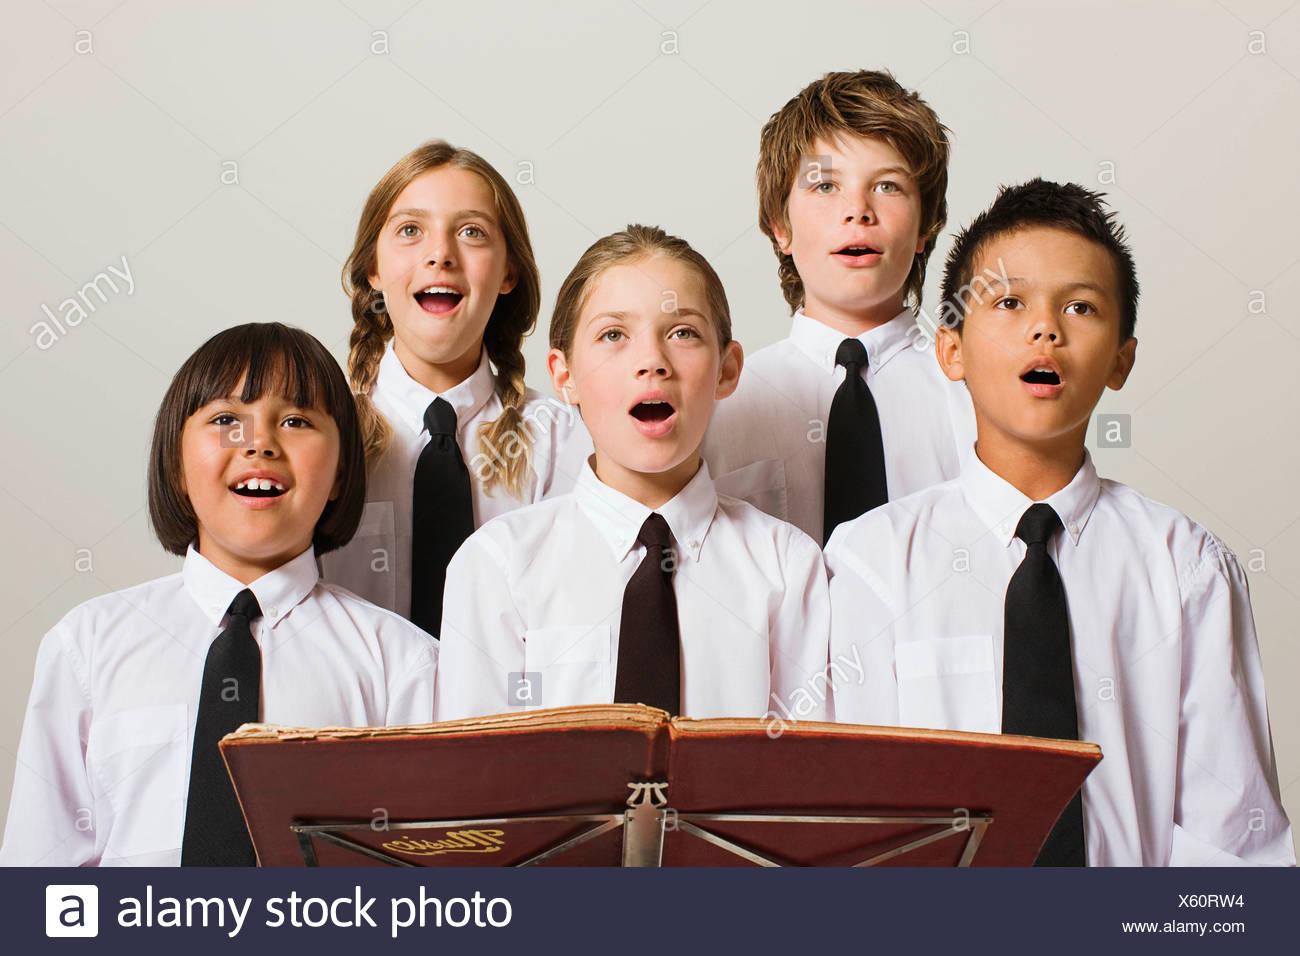 schoolkids singing - Stock Image